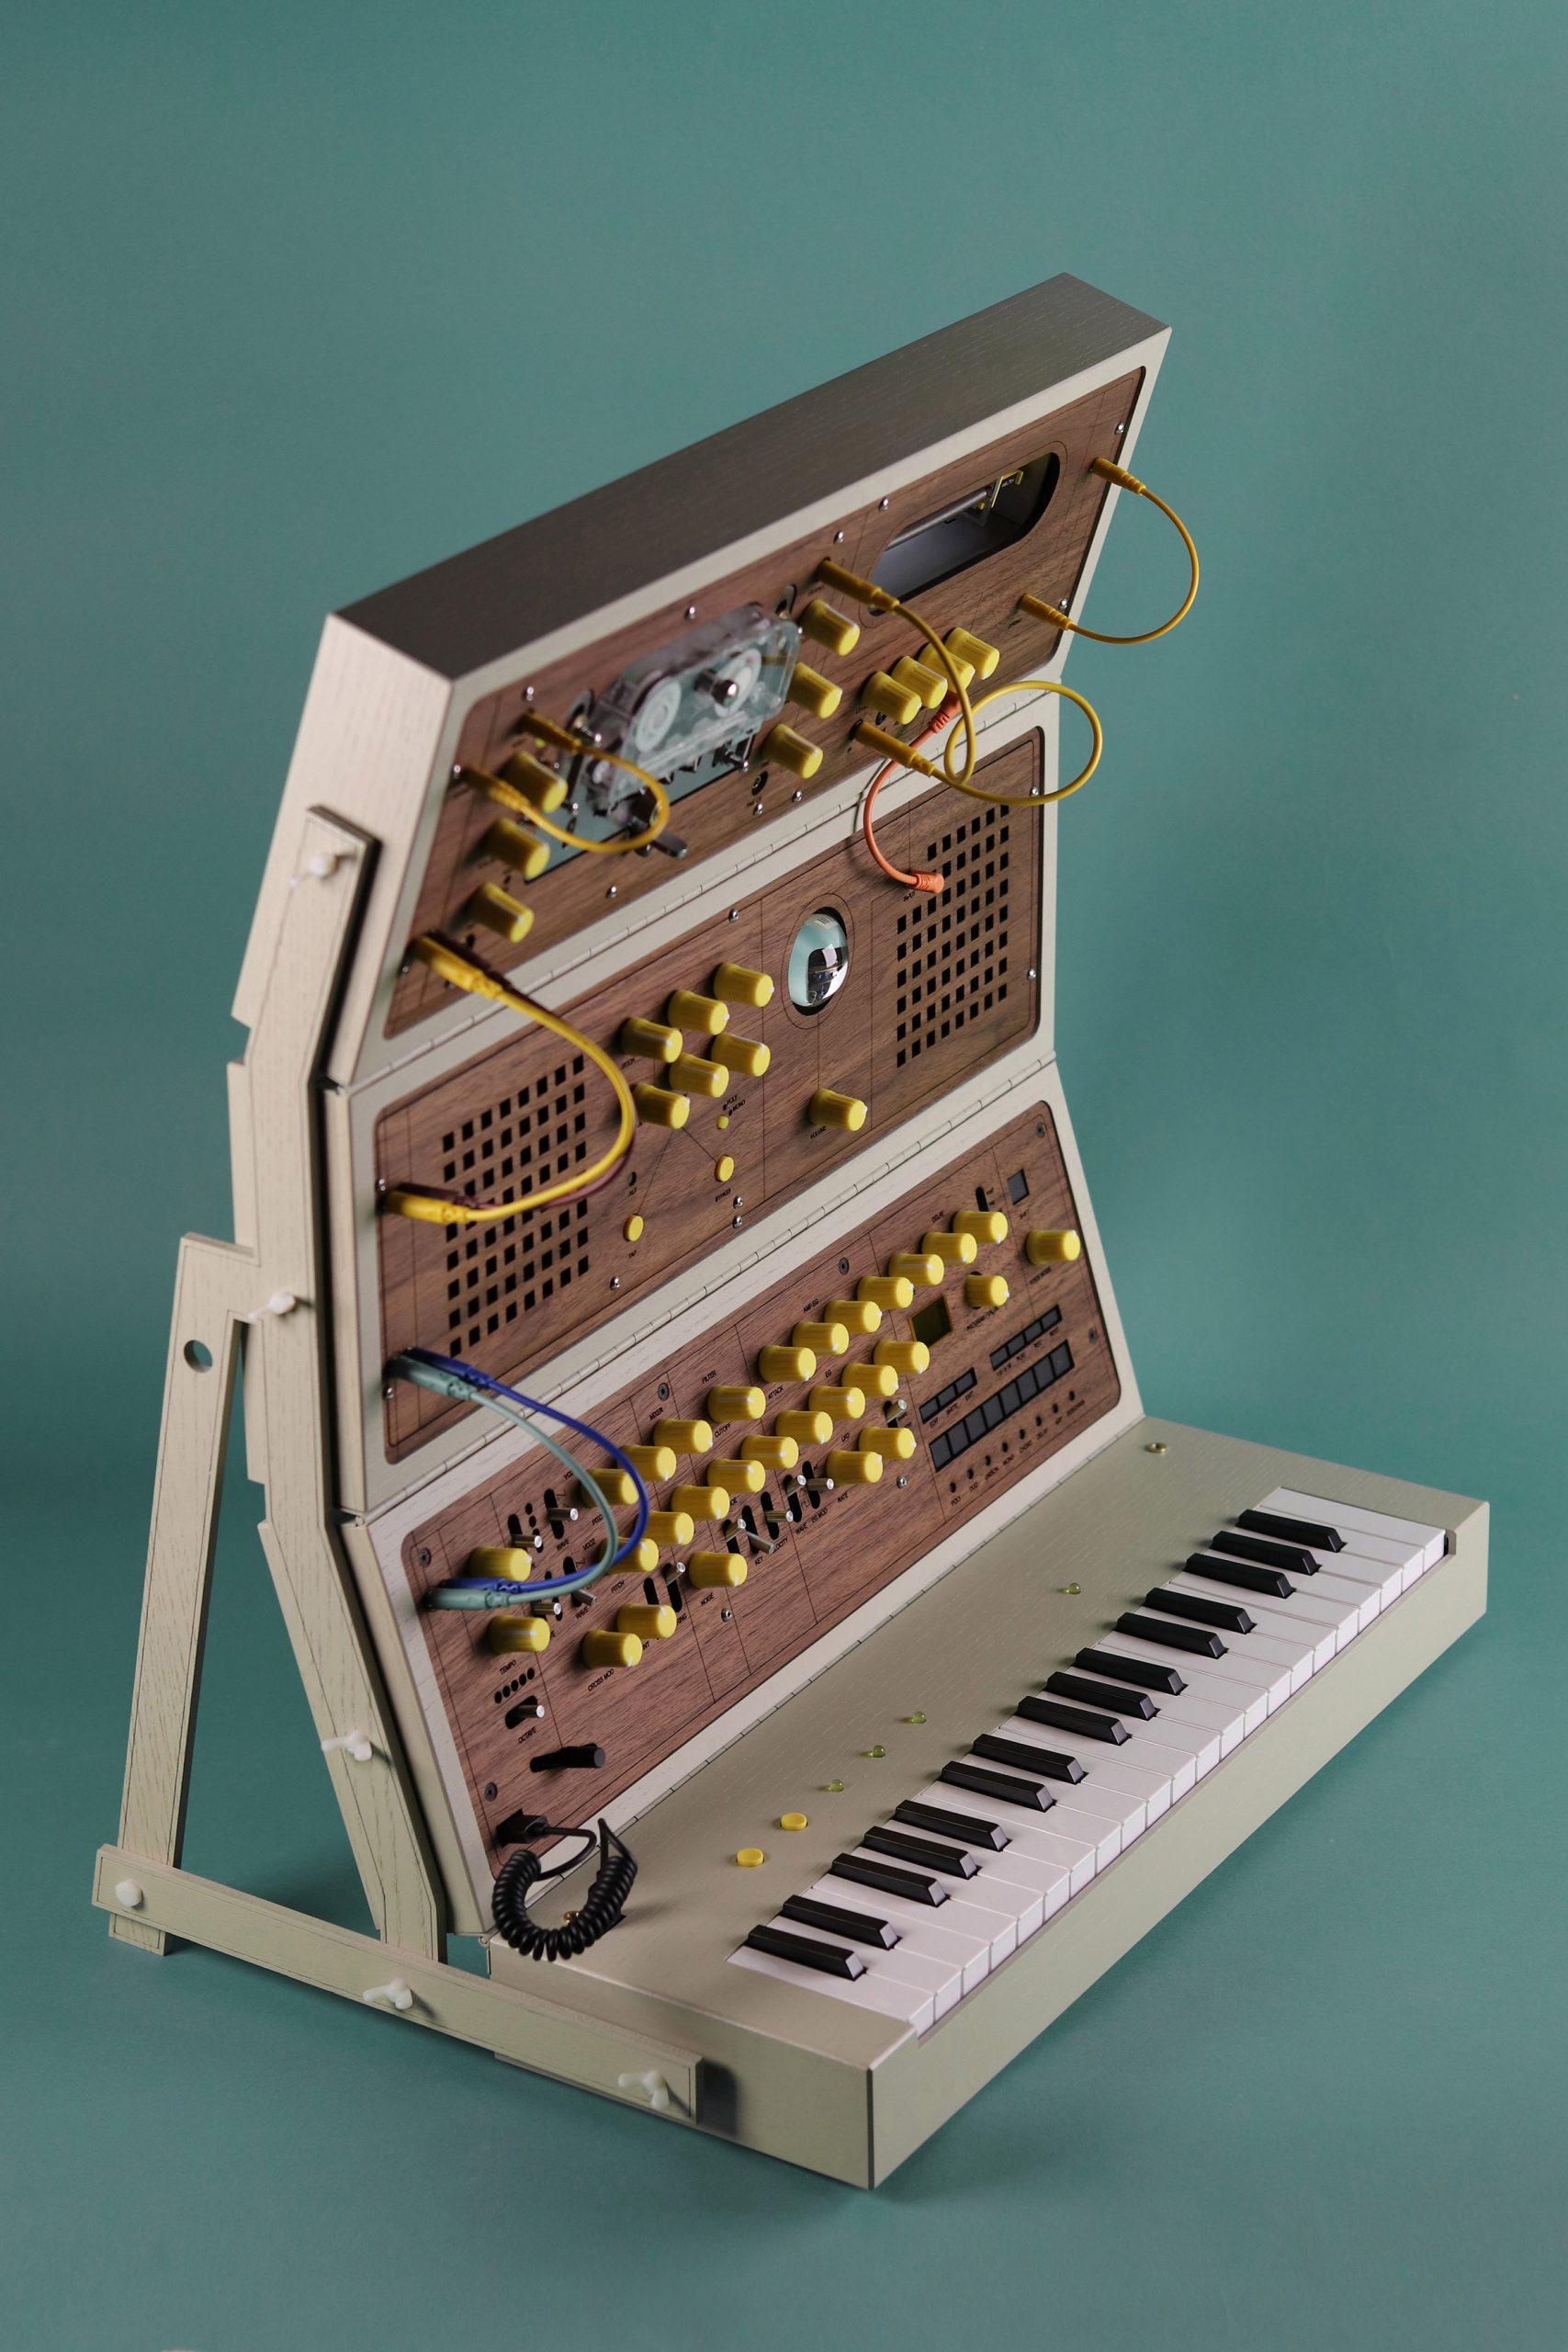 Modular synthesiser in retro wooden case